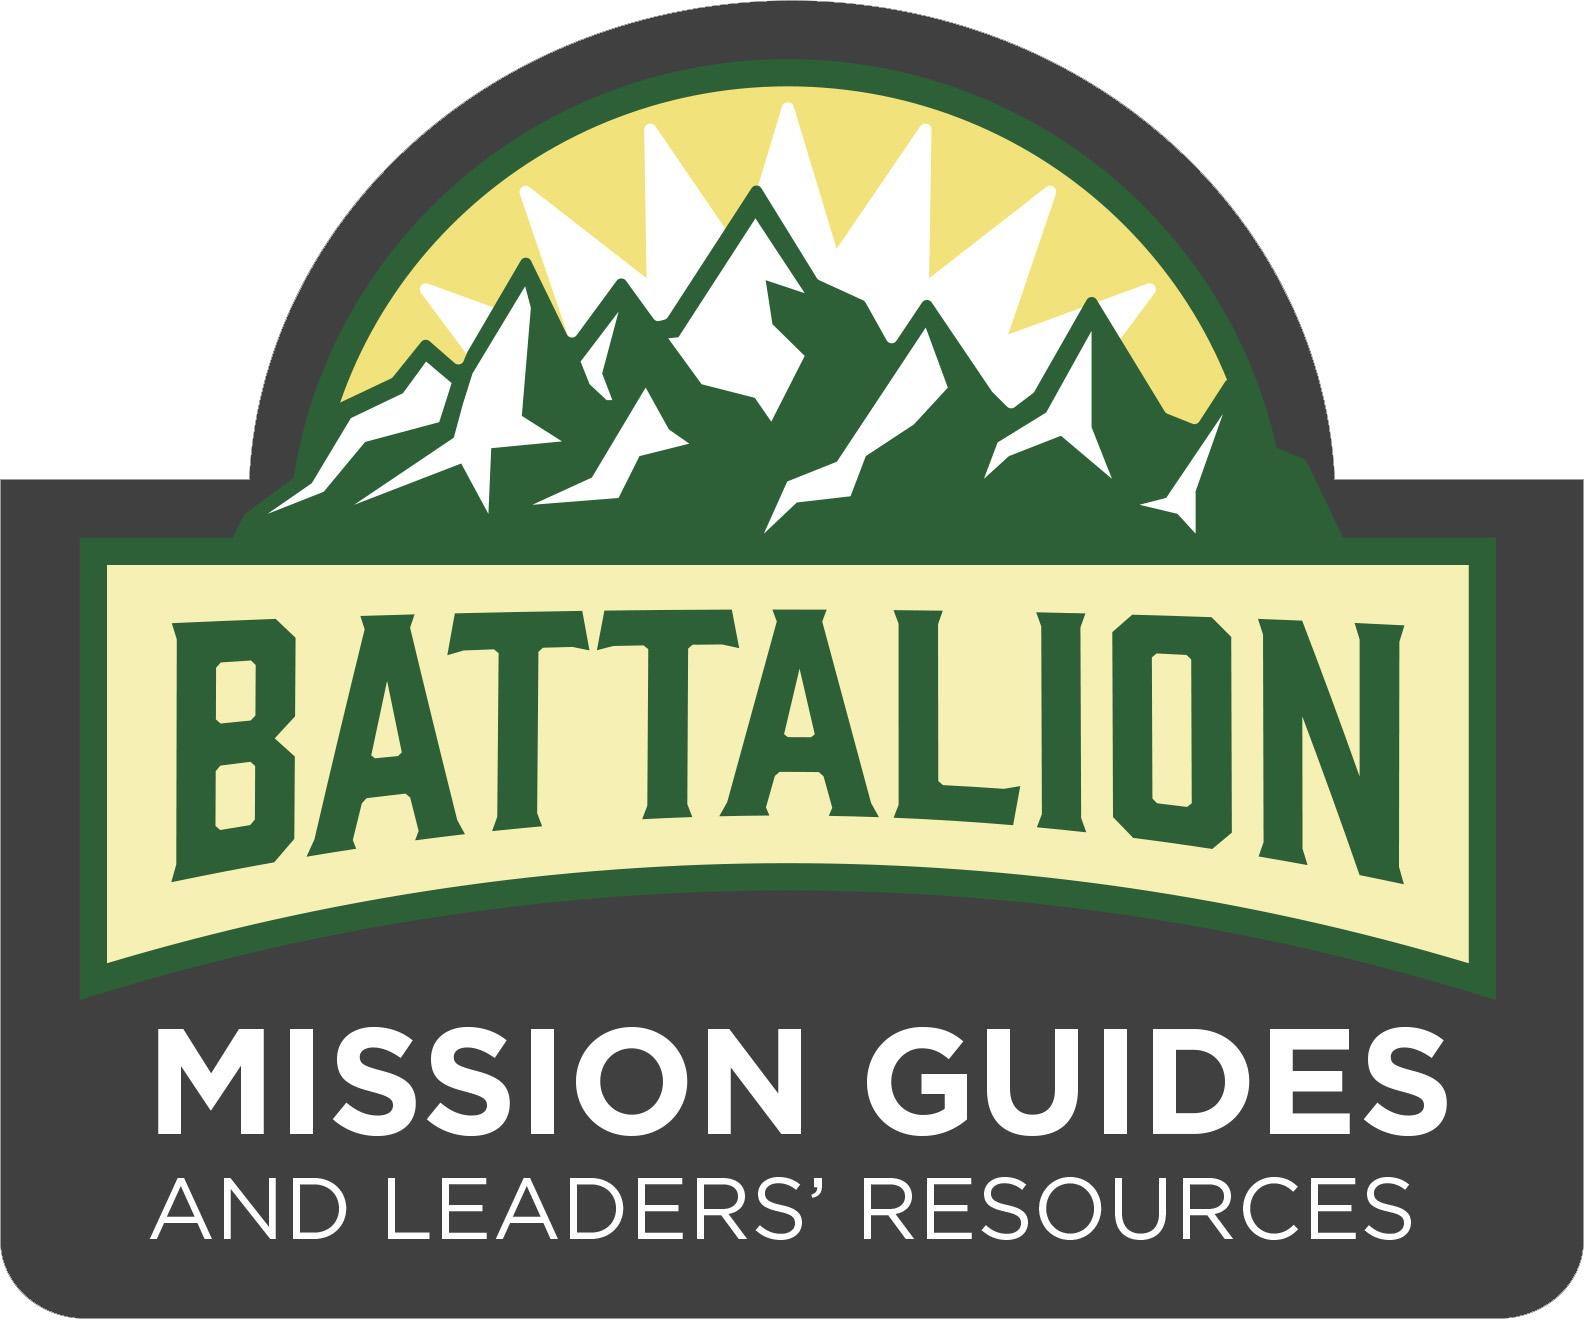 missionguide-logo.jpg